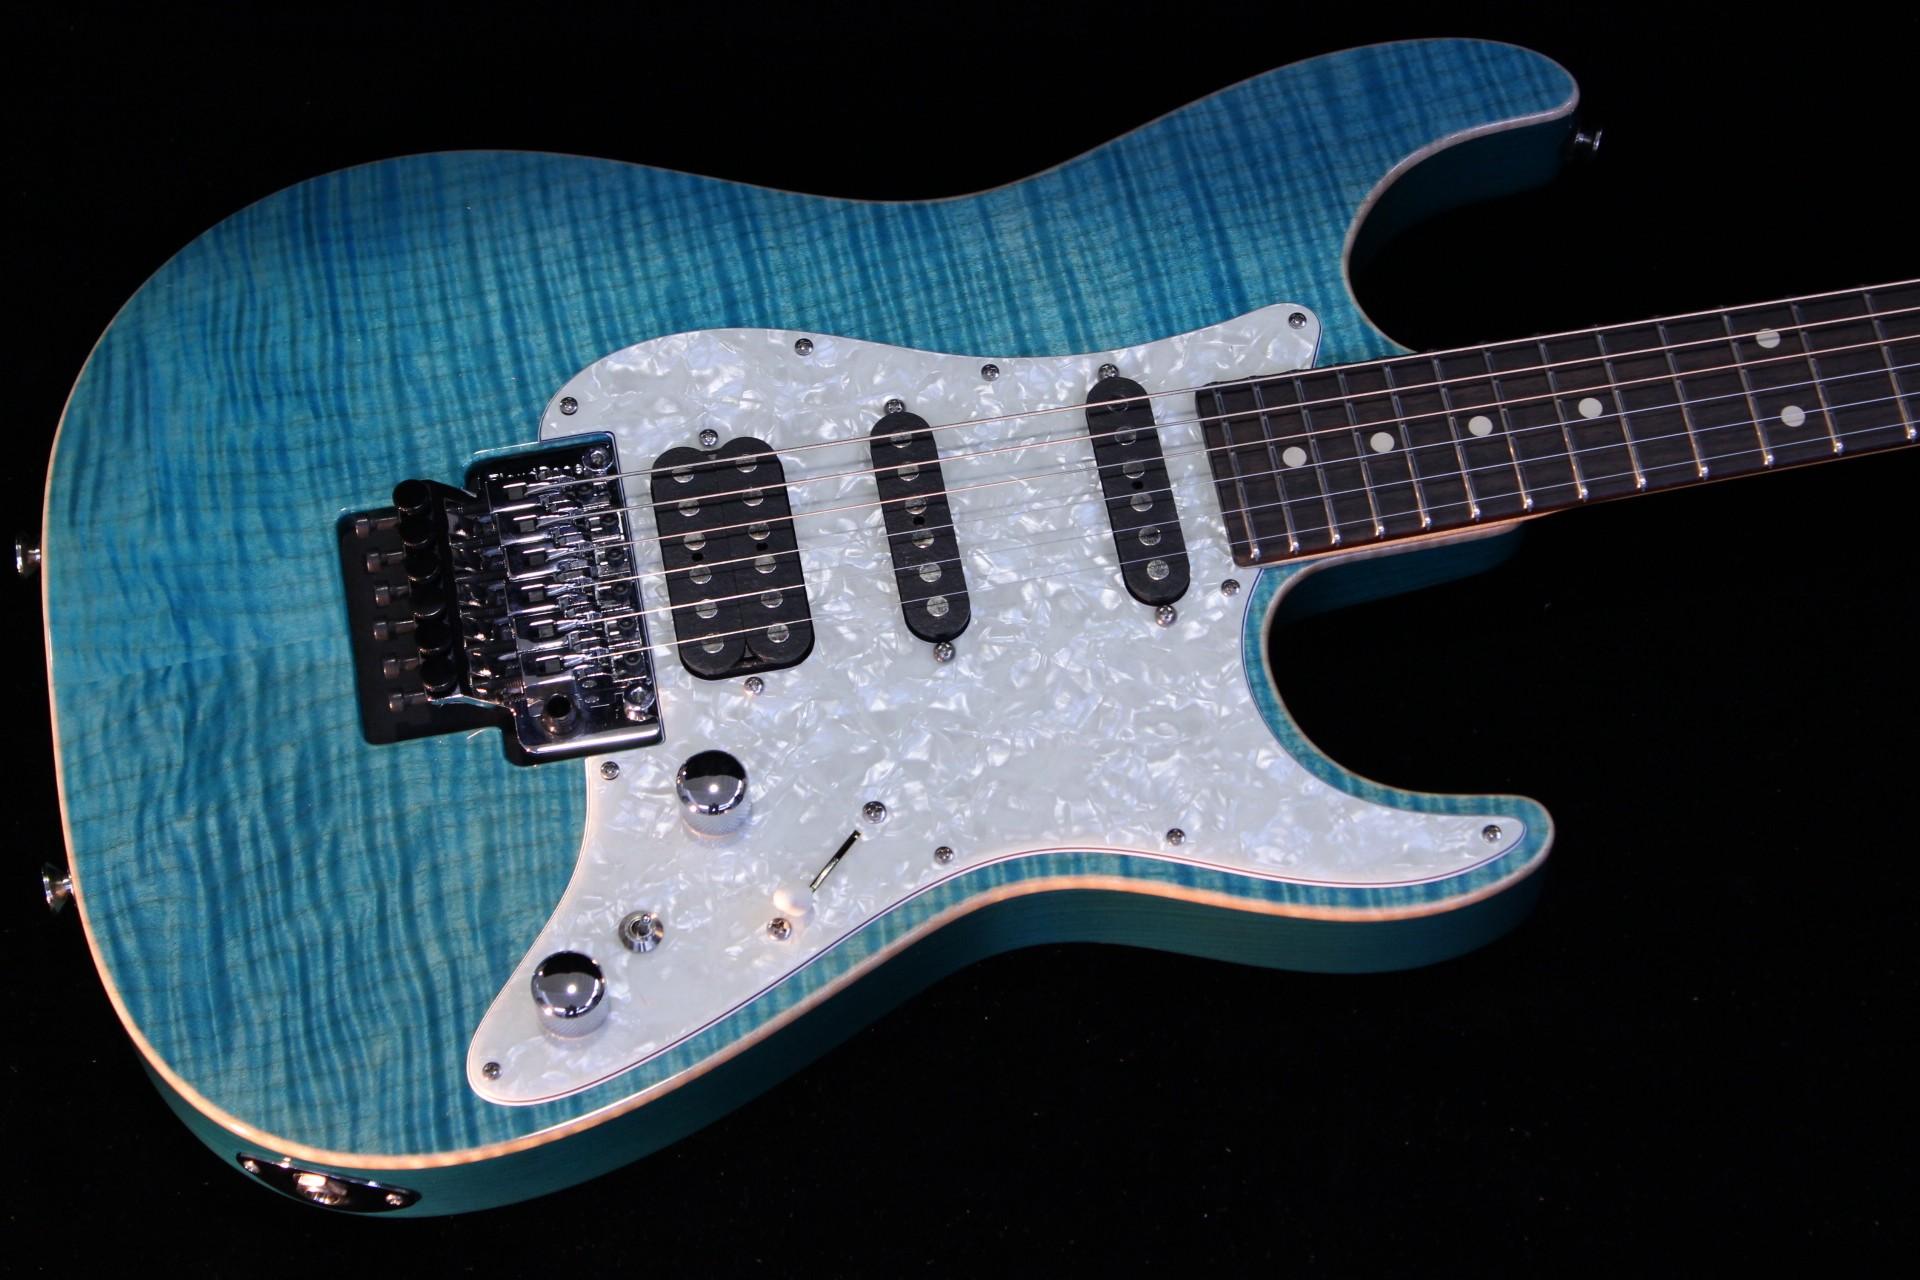 tom anderson drop top classic bora bora blue sn 04 18 14p gino guitars. Black Bedroom Furniture Sets. Home Design Ideas